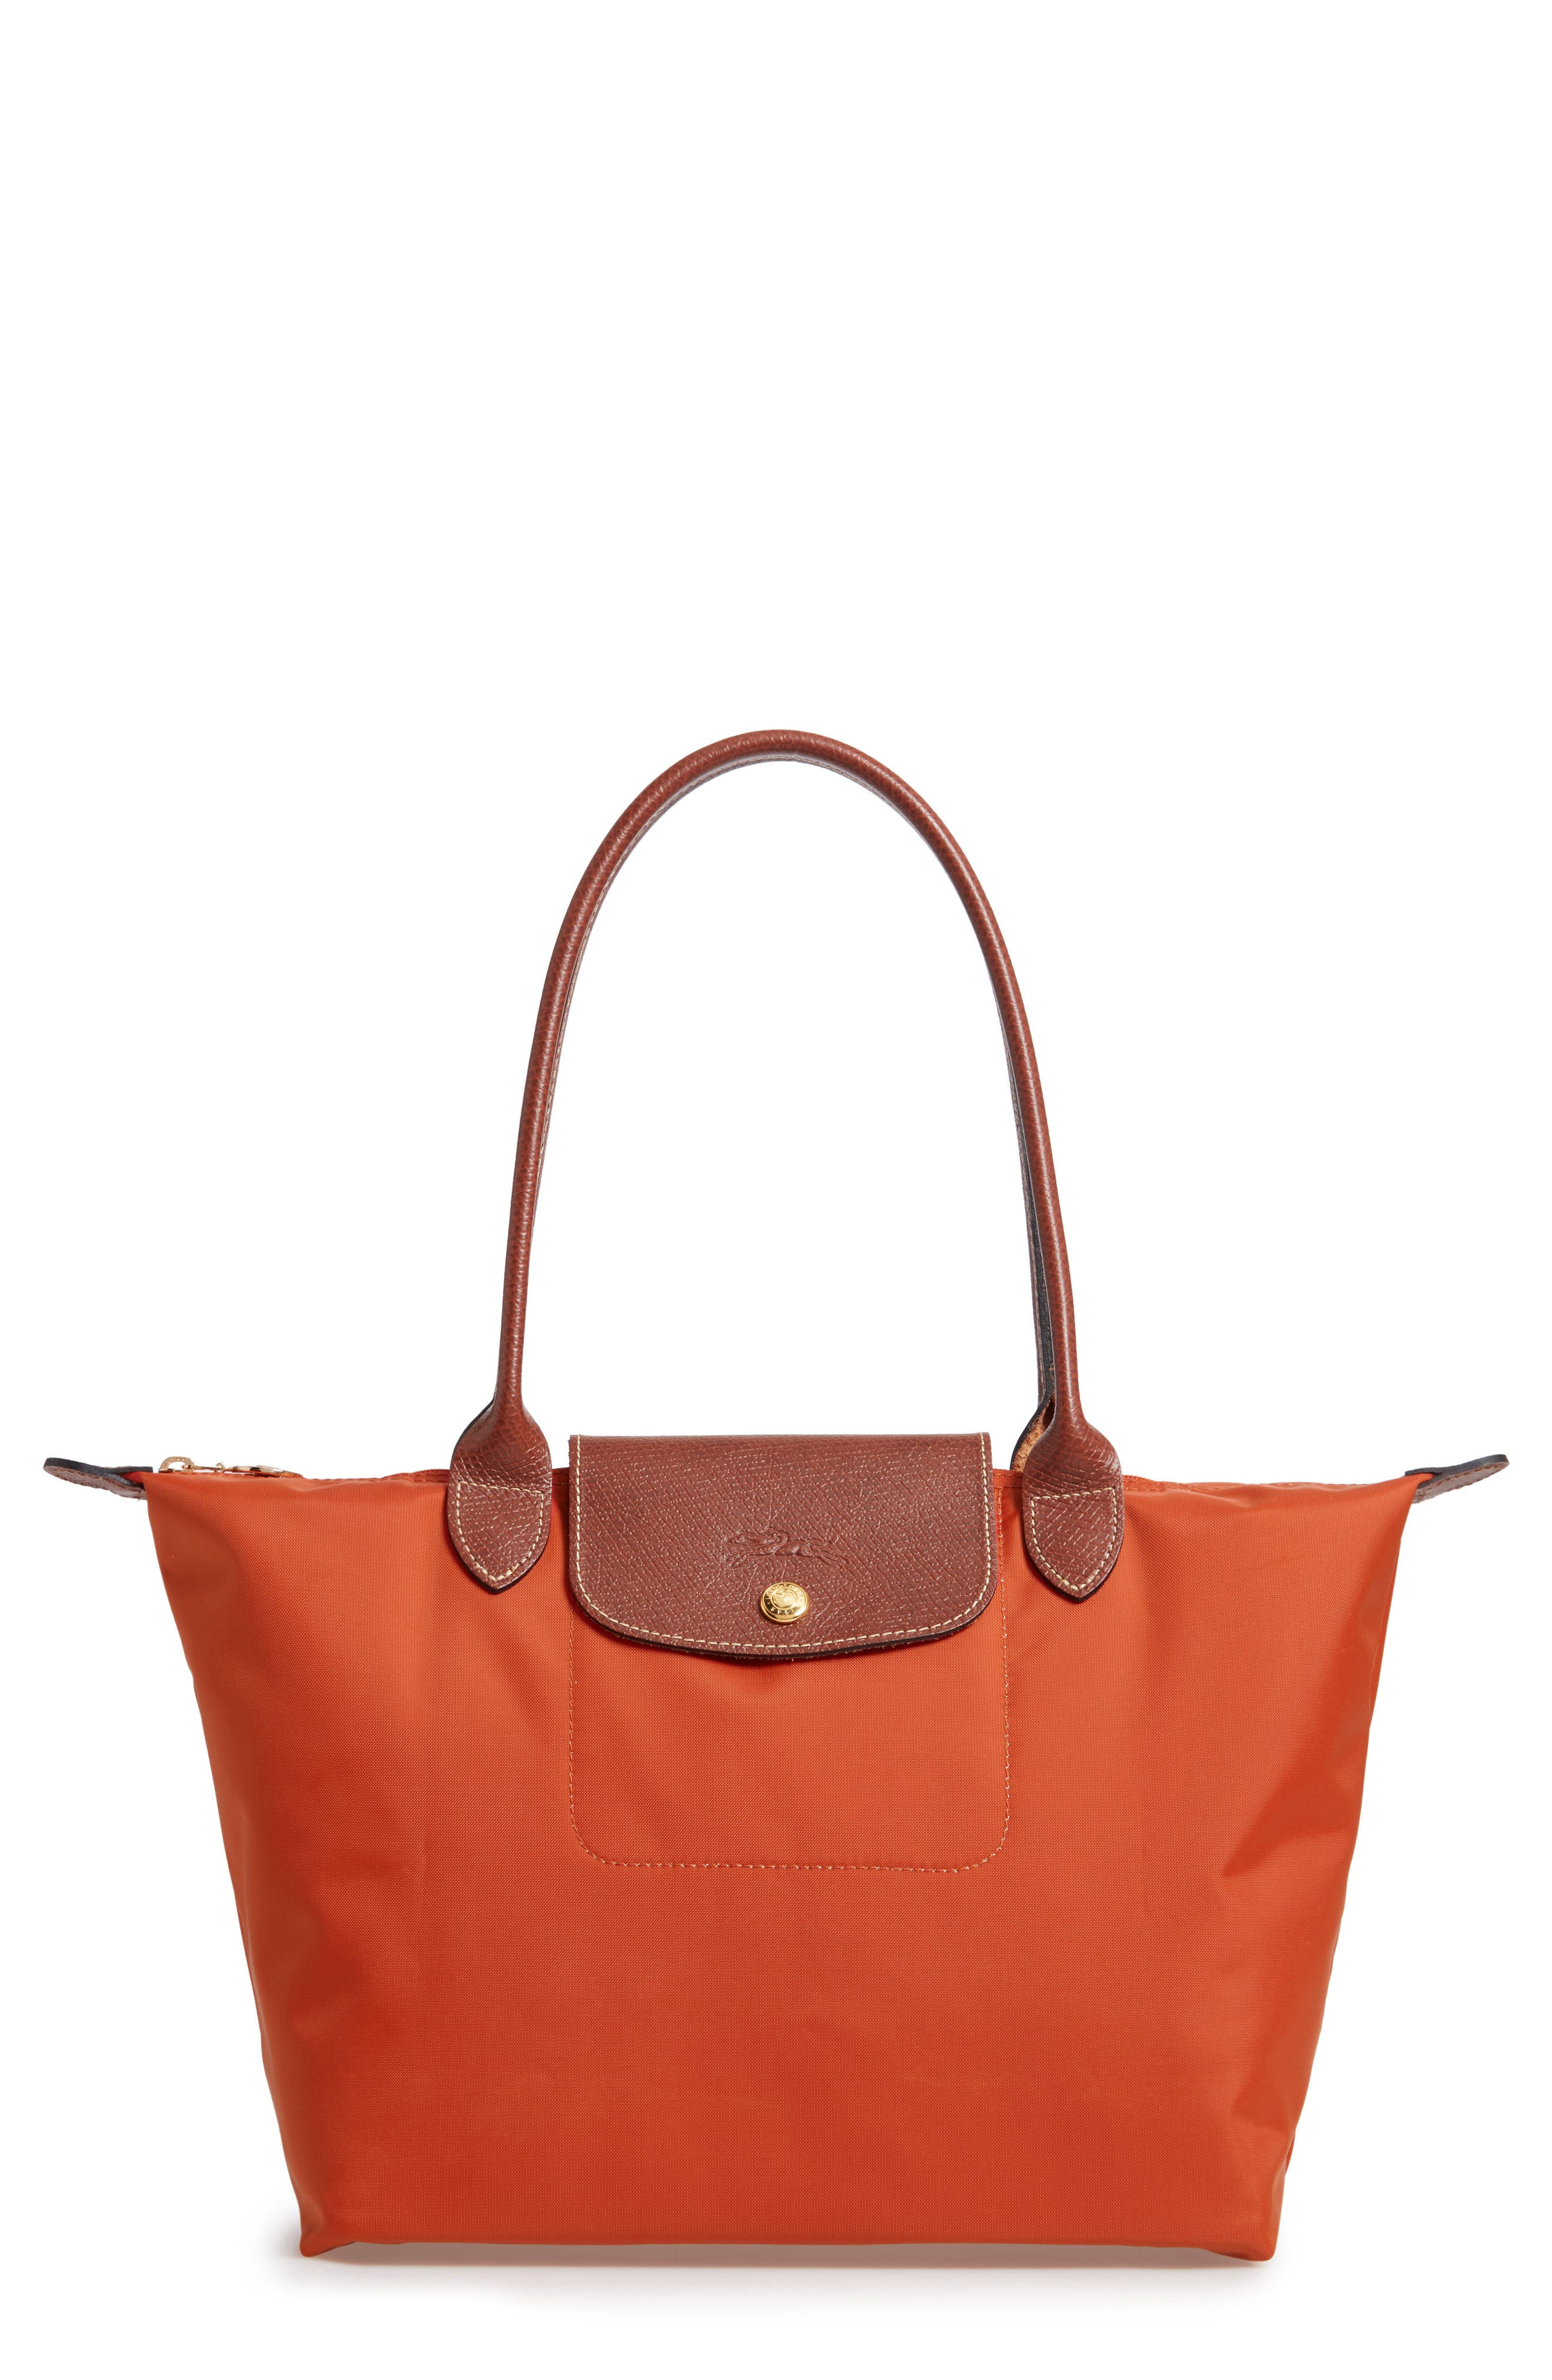 cb061428134b Handbags   Wallets for Women